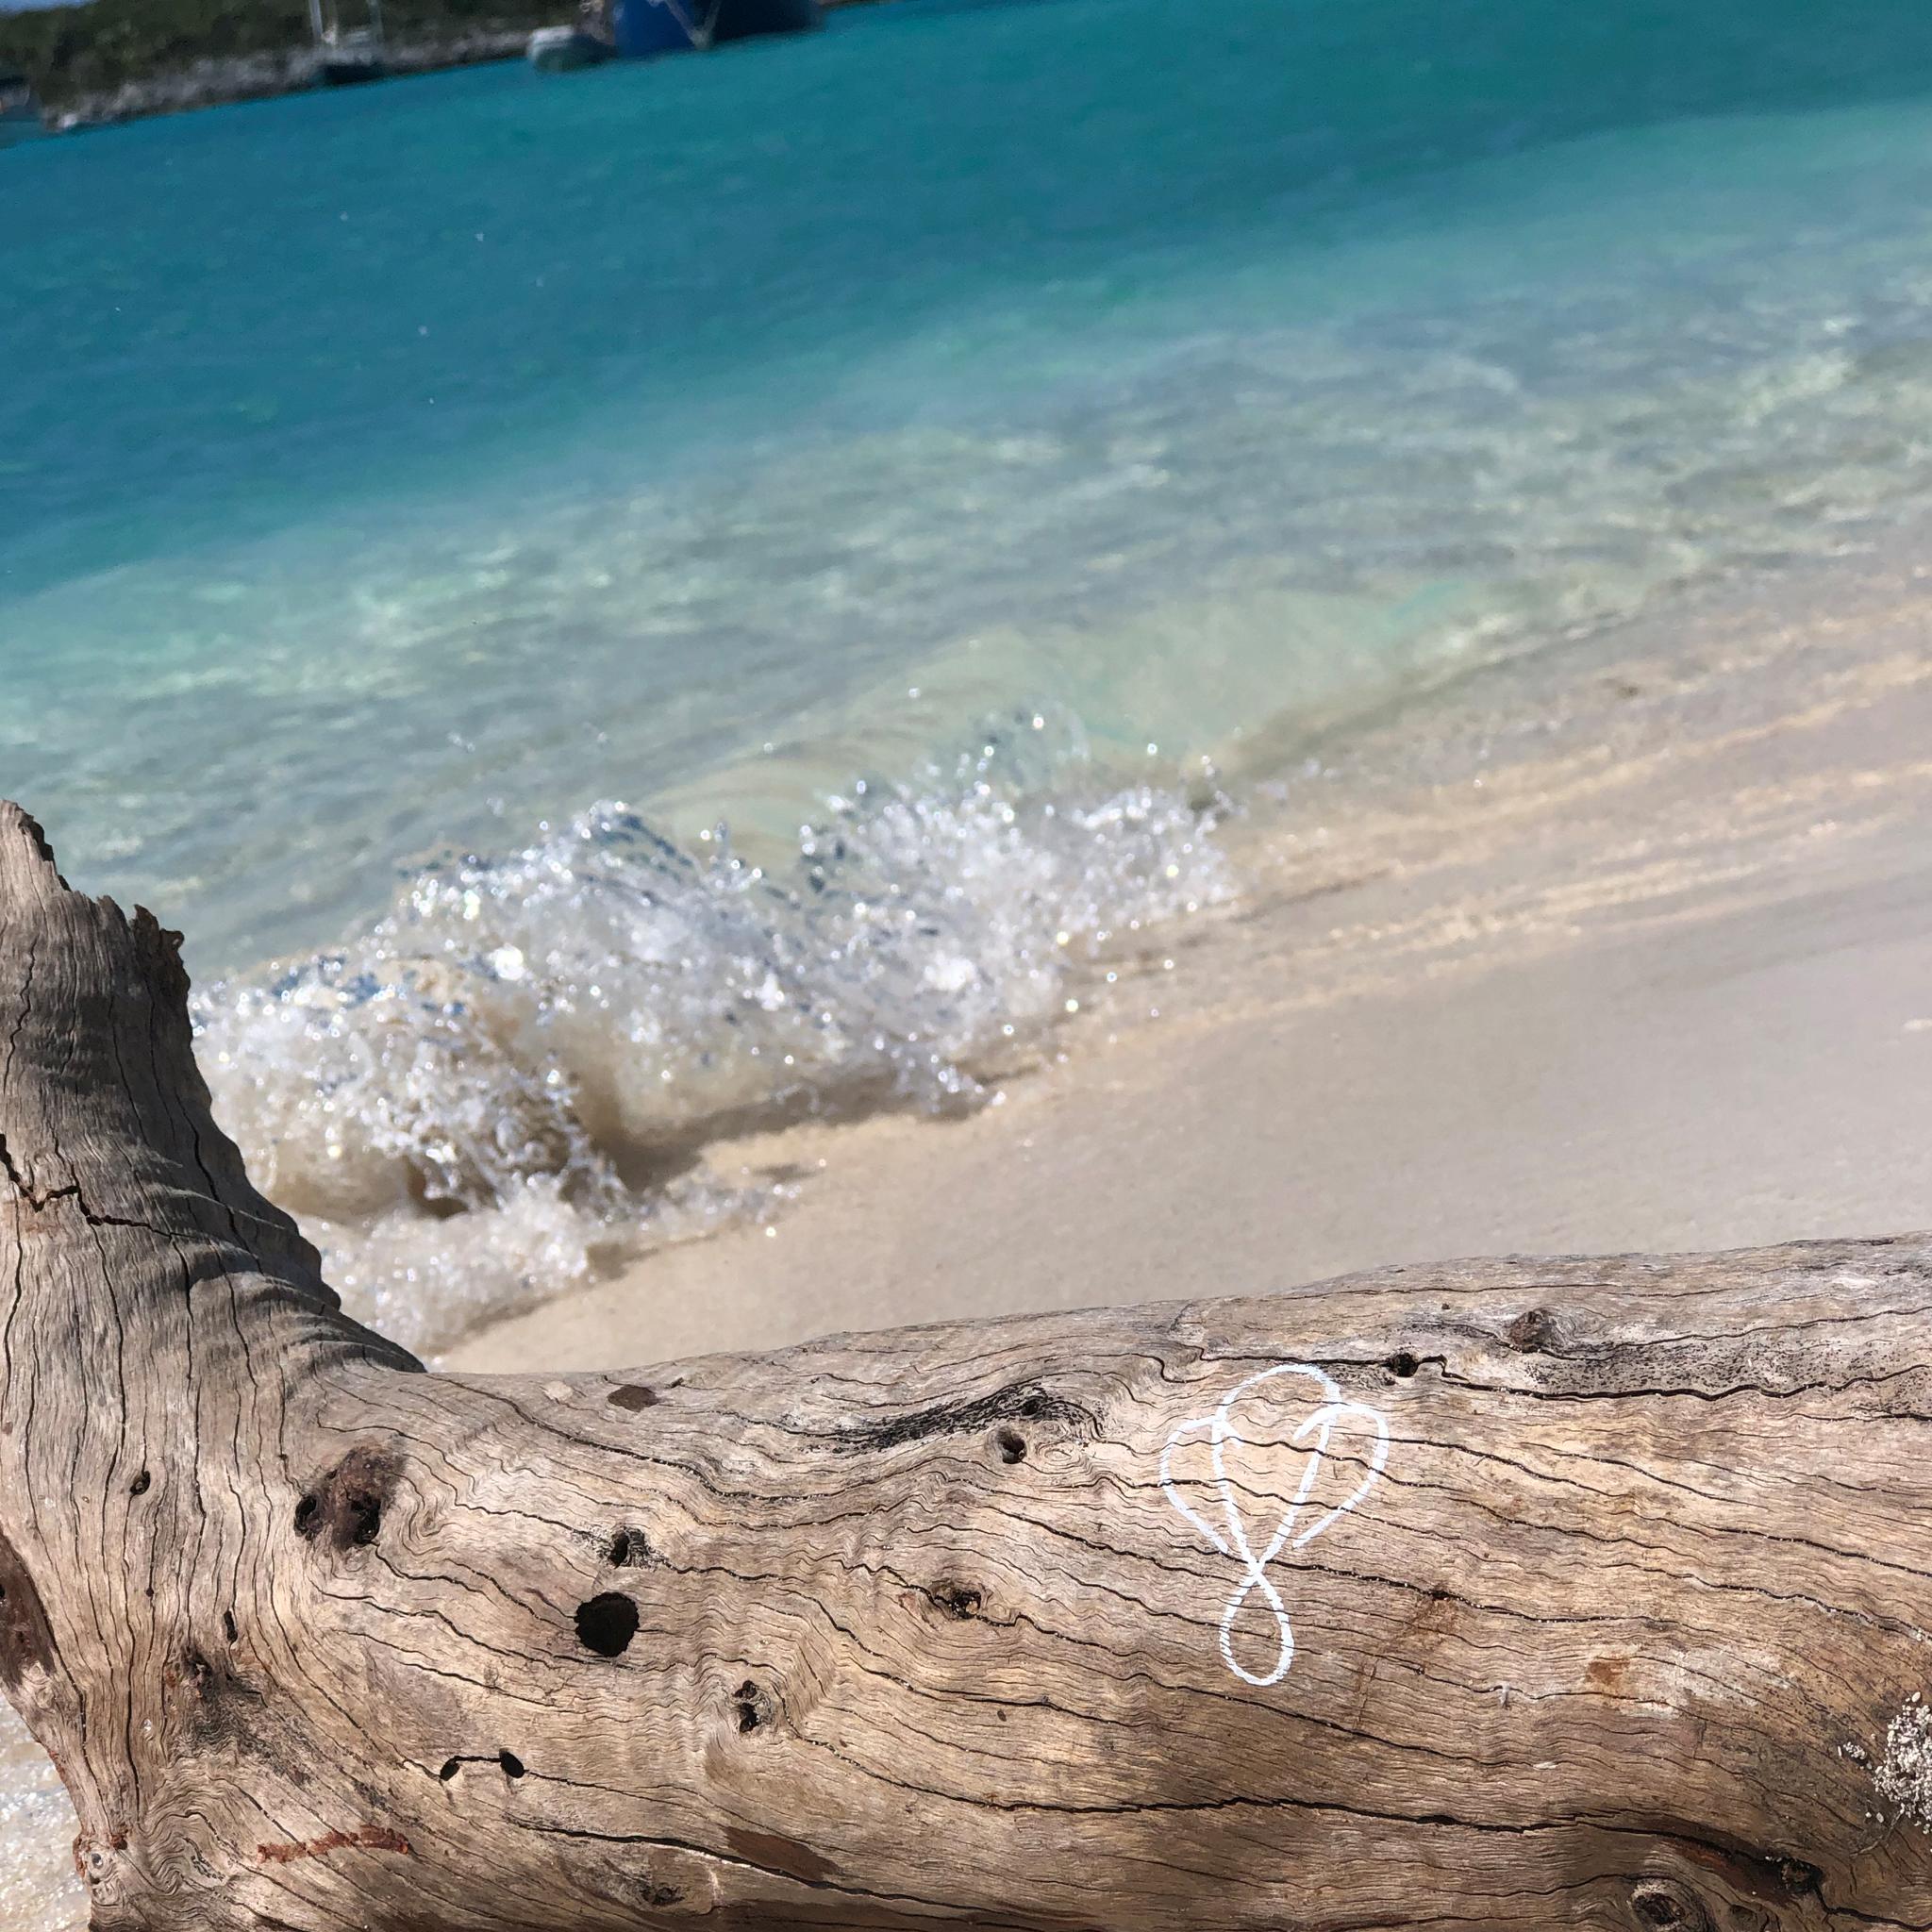 Infinite Love Logo by Big Lovie on beach in Exuma, Bahamas